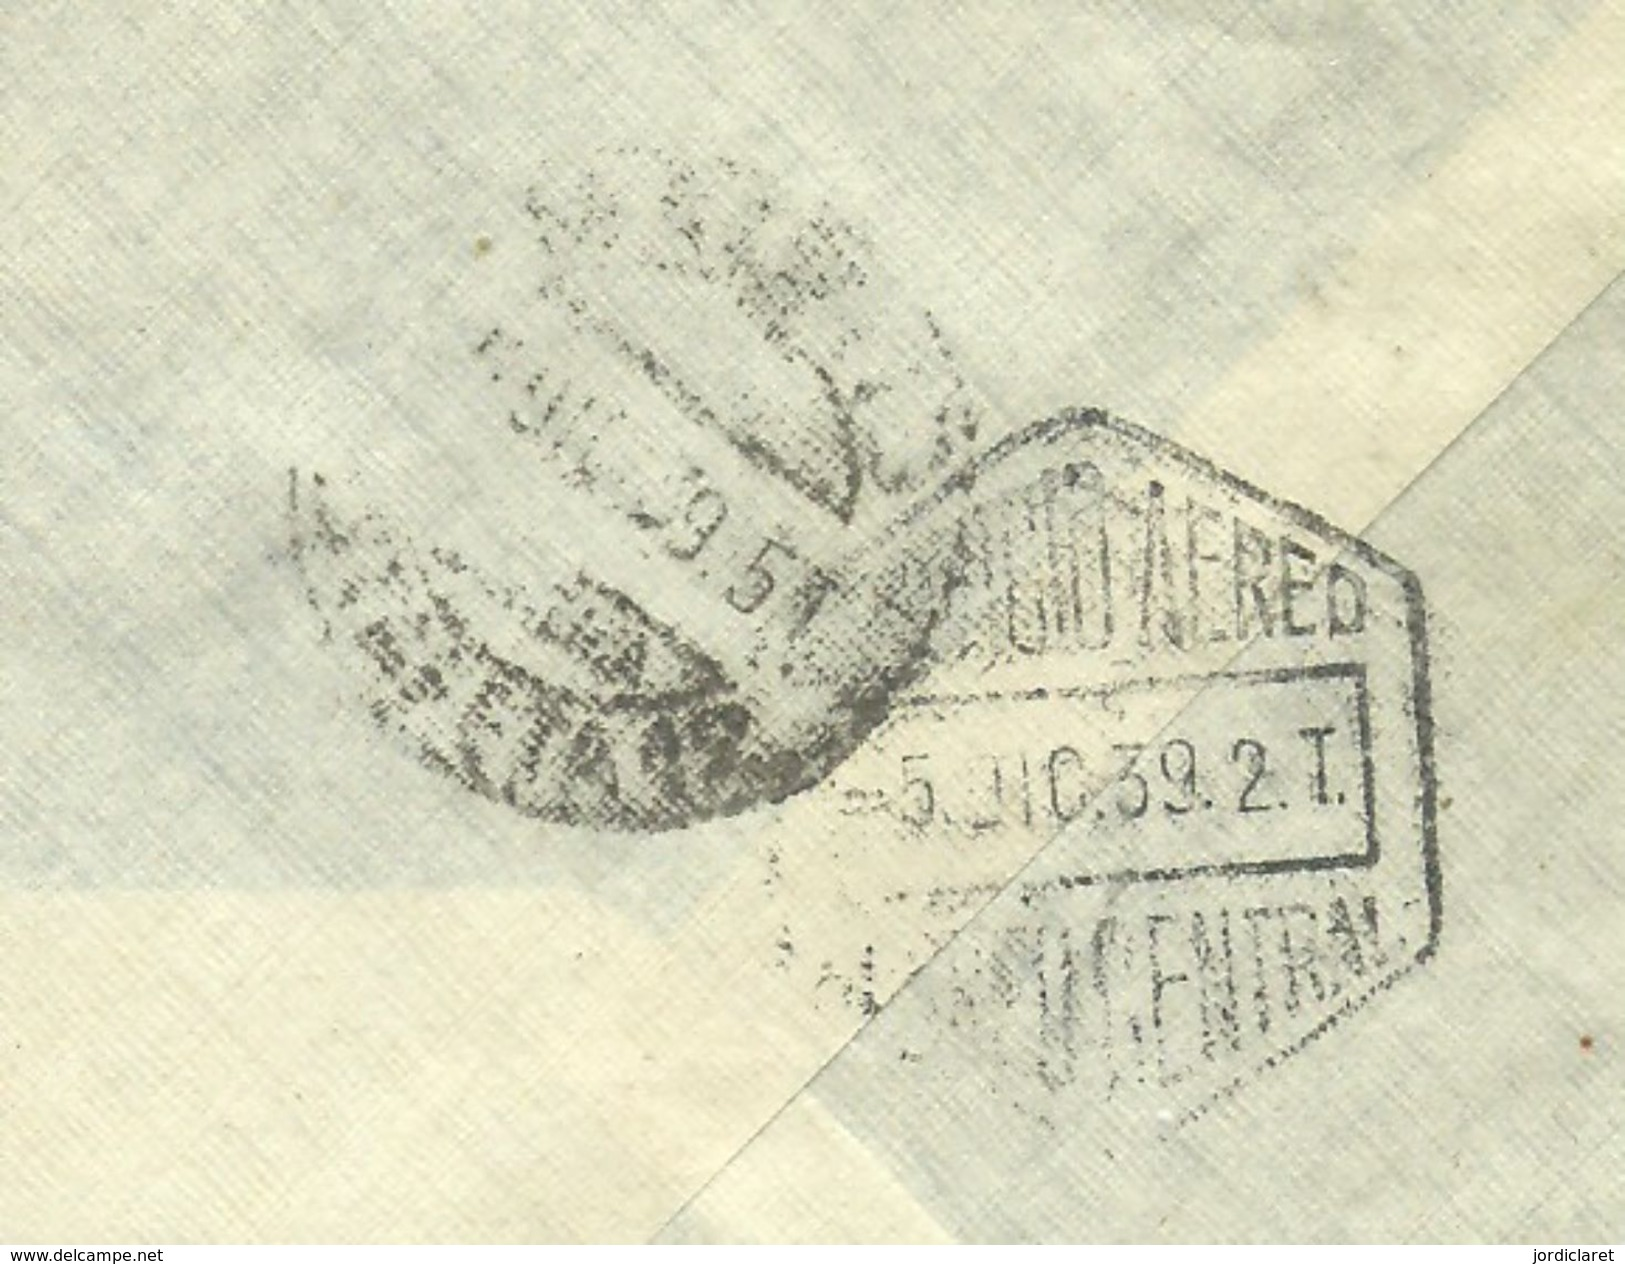 CARTA CENSURA  1939   LAS PALMAS SCANER - Marcas De Censura Nacional